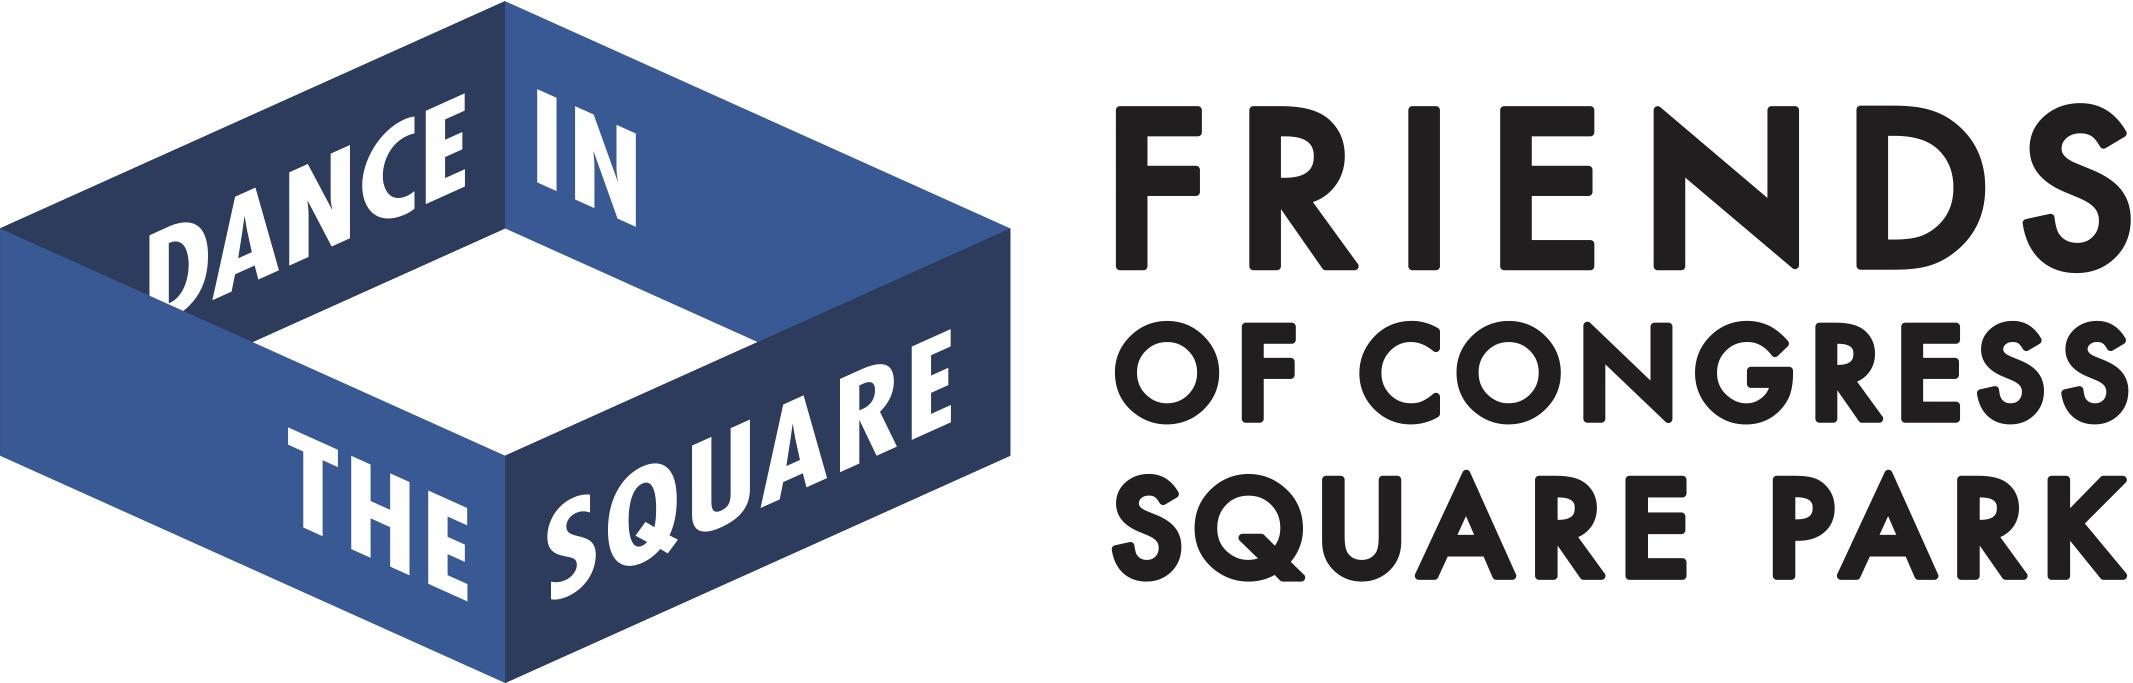 Congress Square Park.jpg